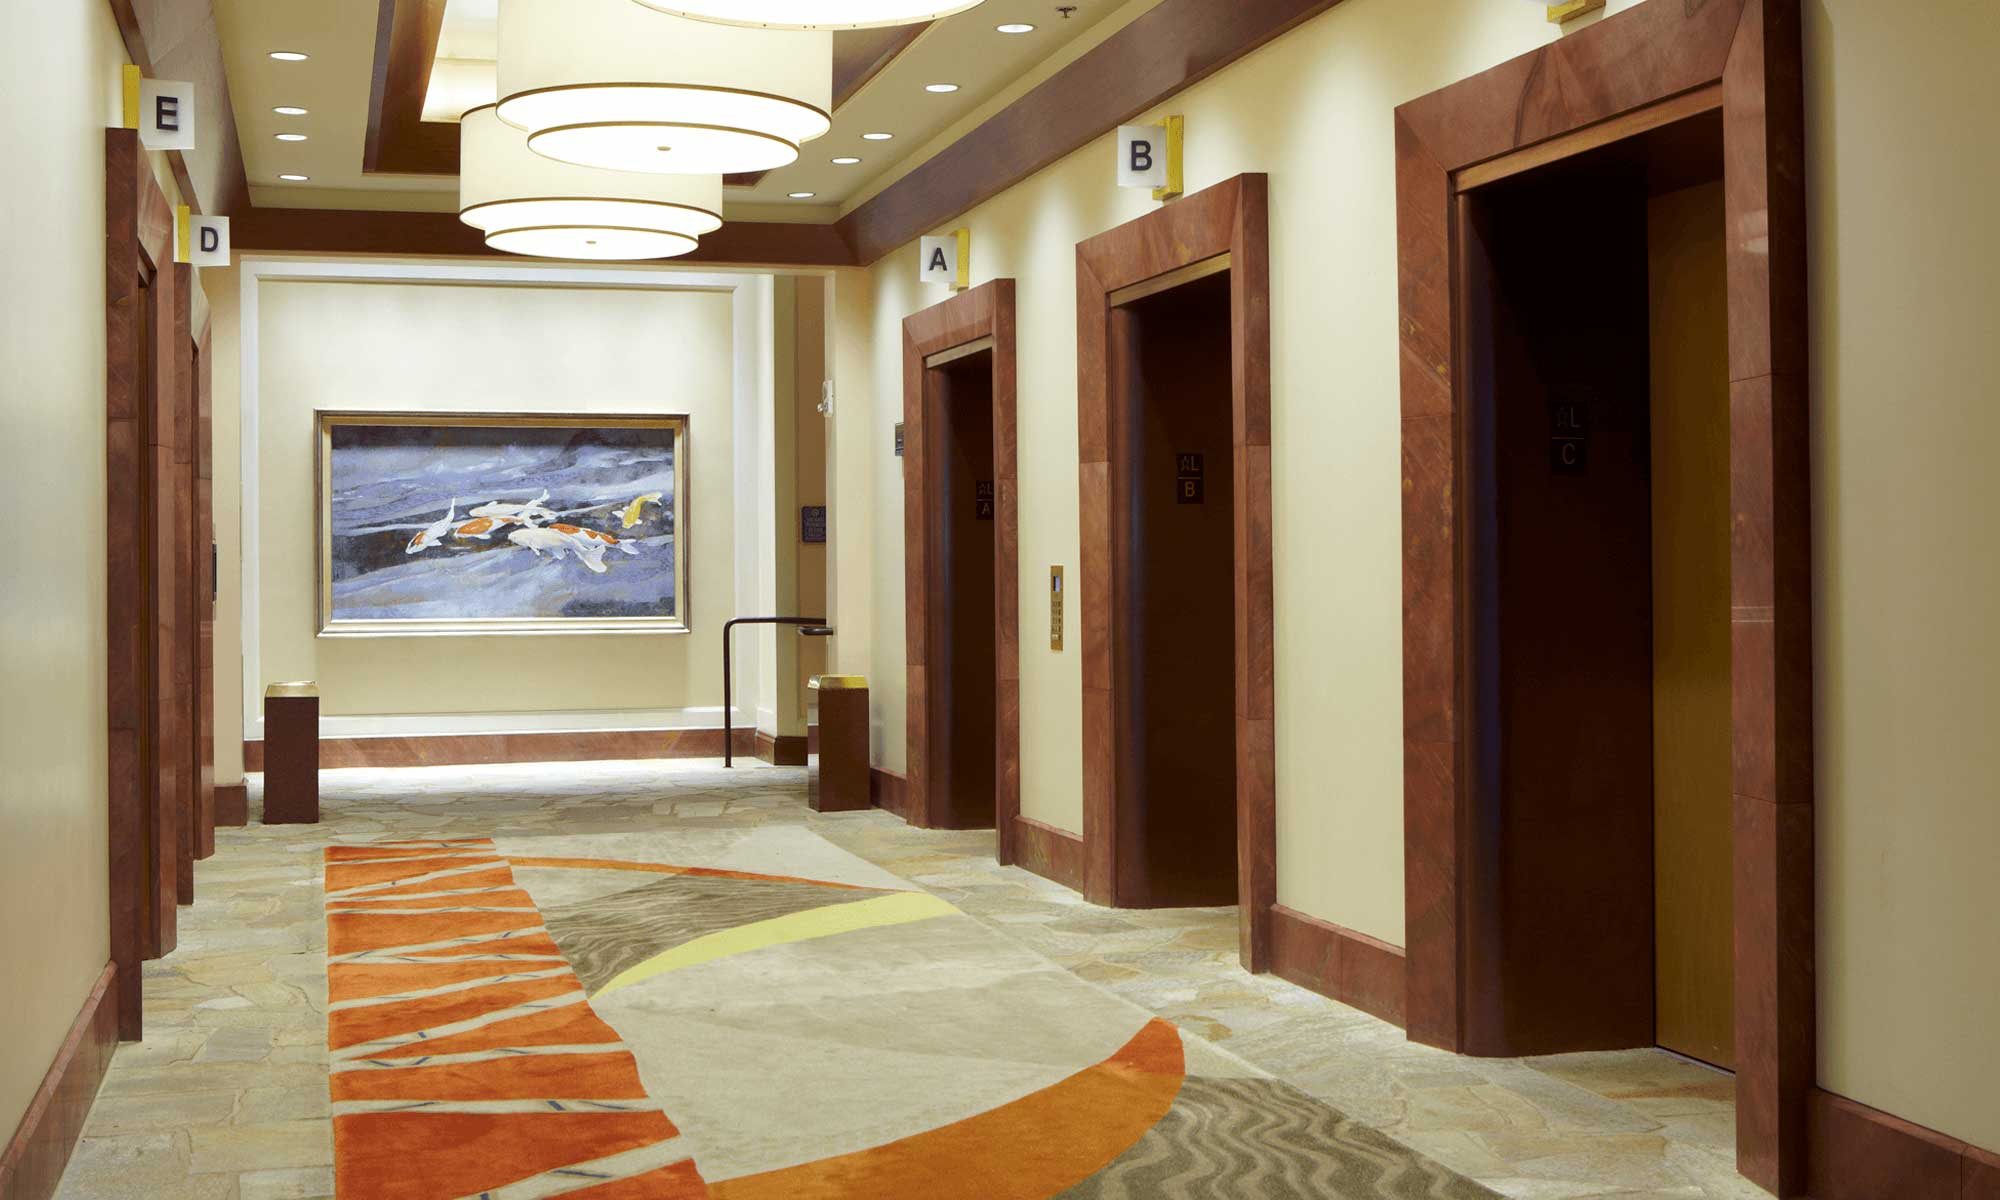 Hilton Hawaiian Village Rainbow Tower Lobby And Room Architecture Interior Design Layout